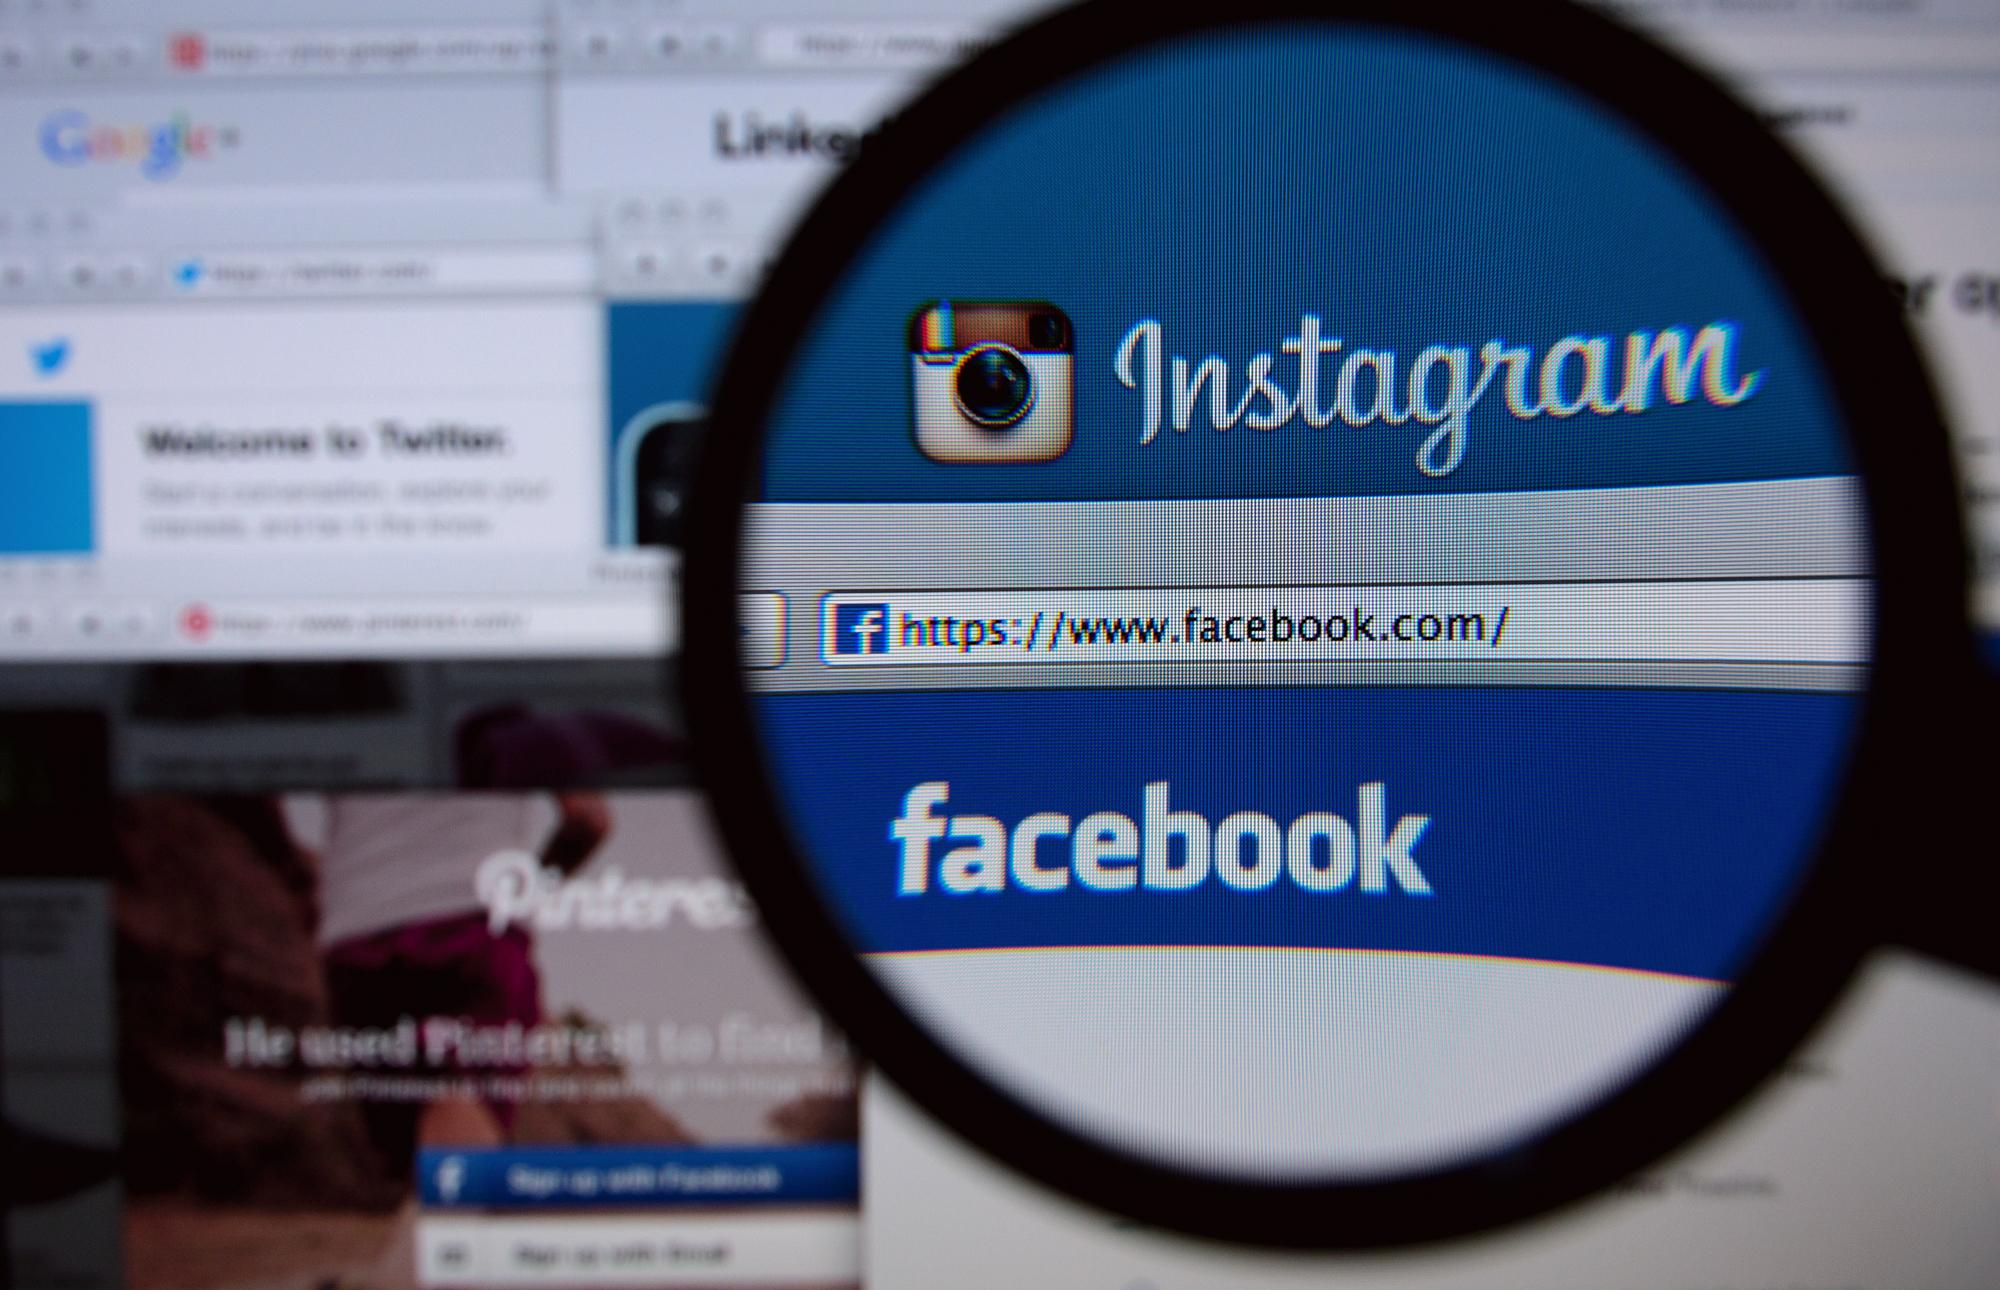 Facebook e Instagram numa lupa